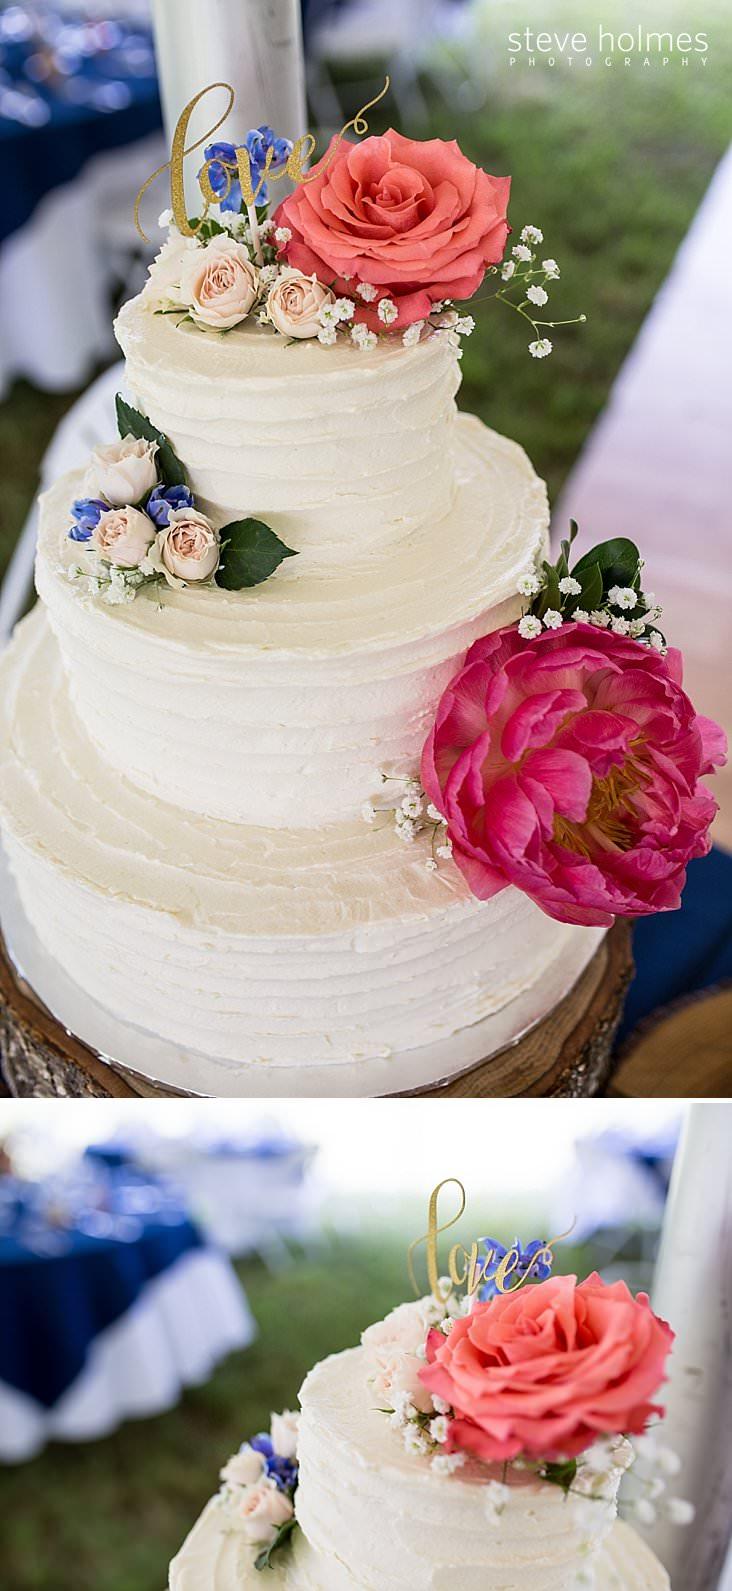 19_Three tiered wedding cake with flowers.jpg